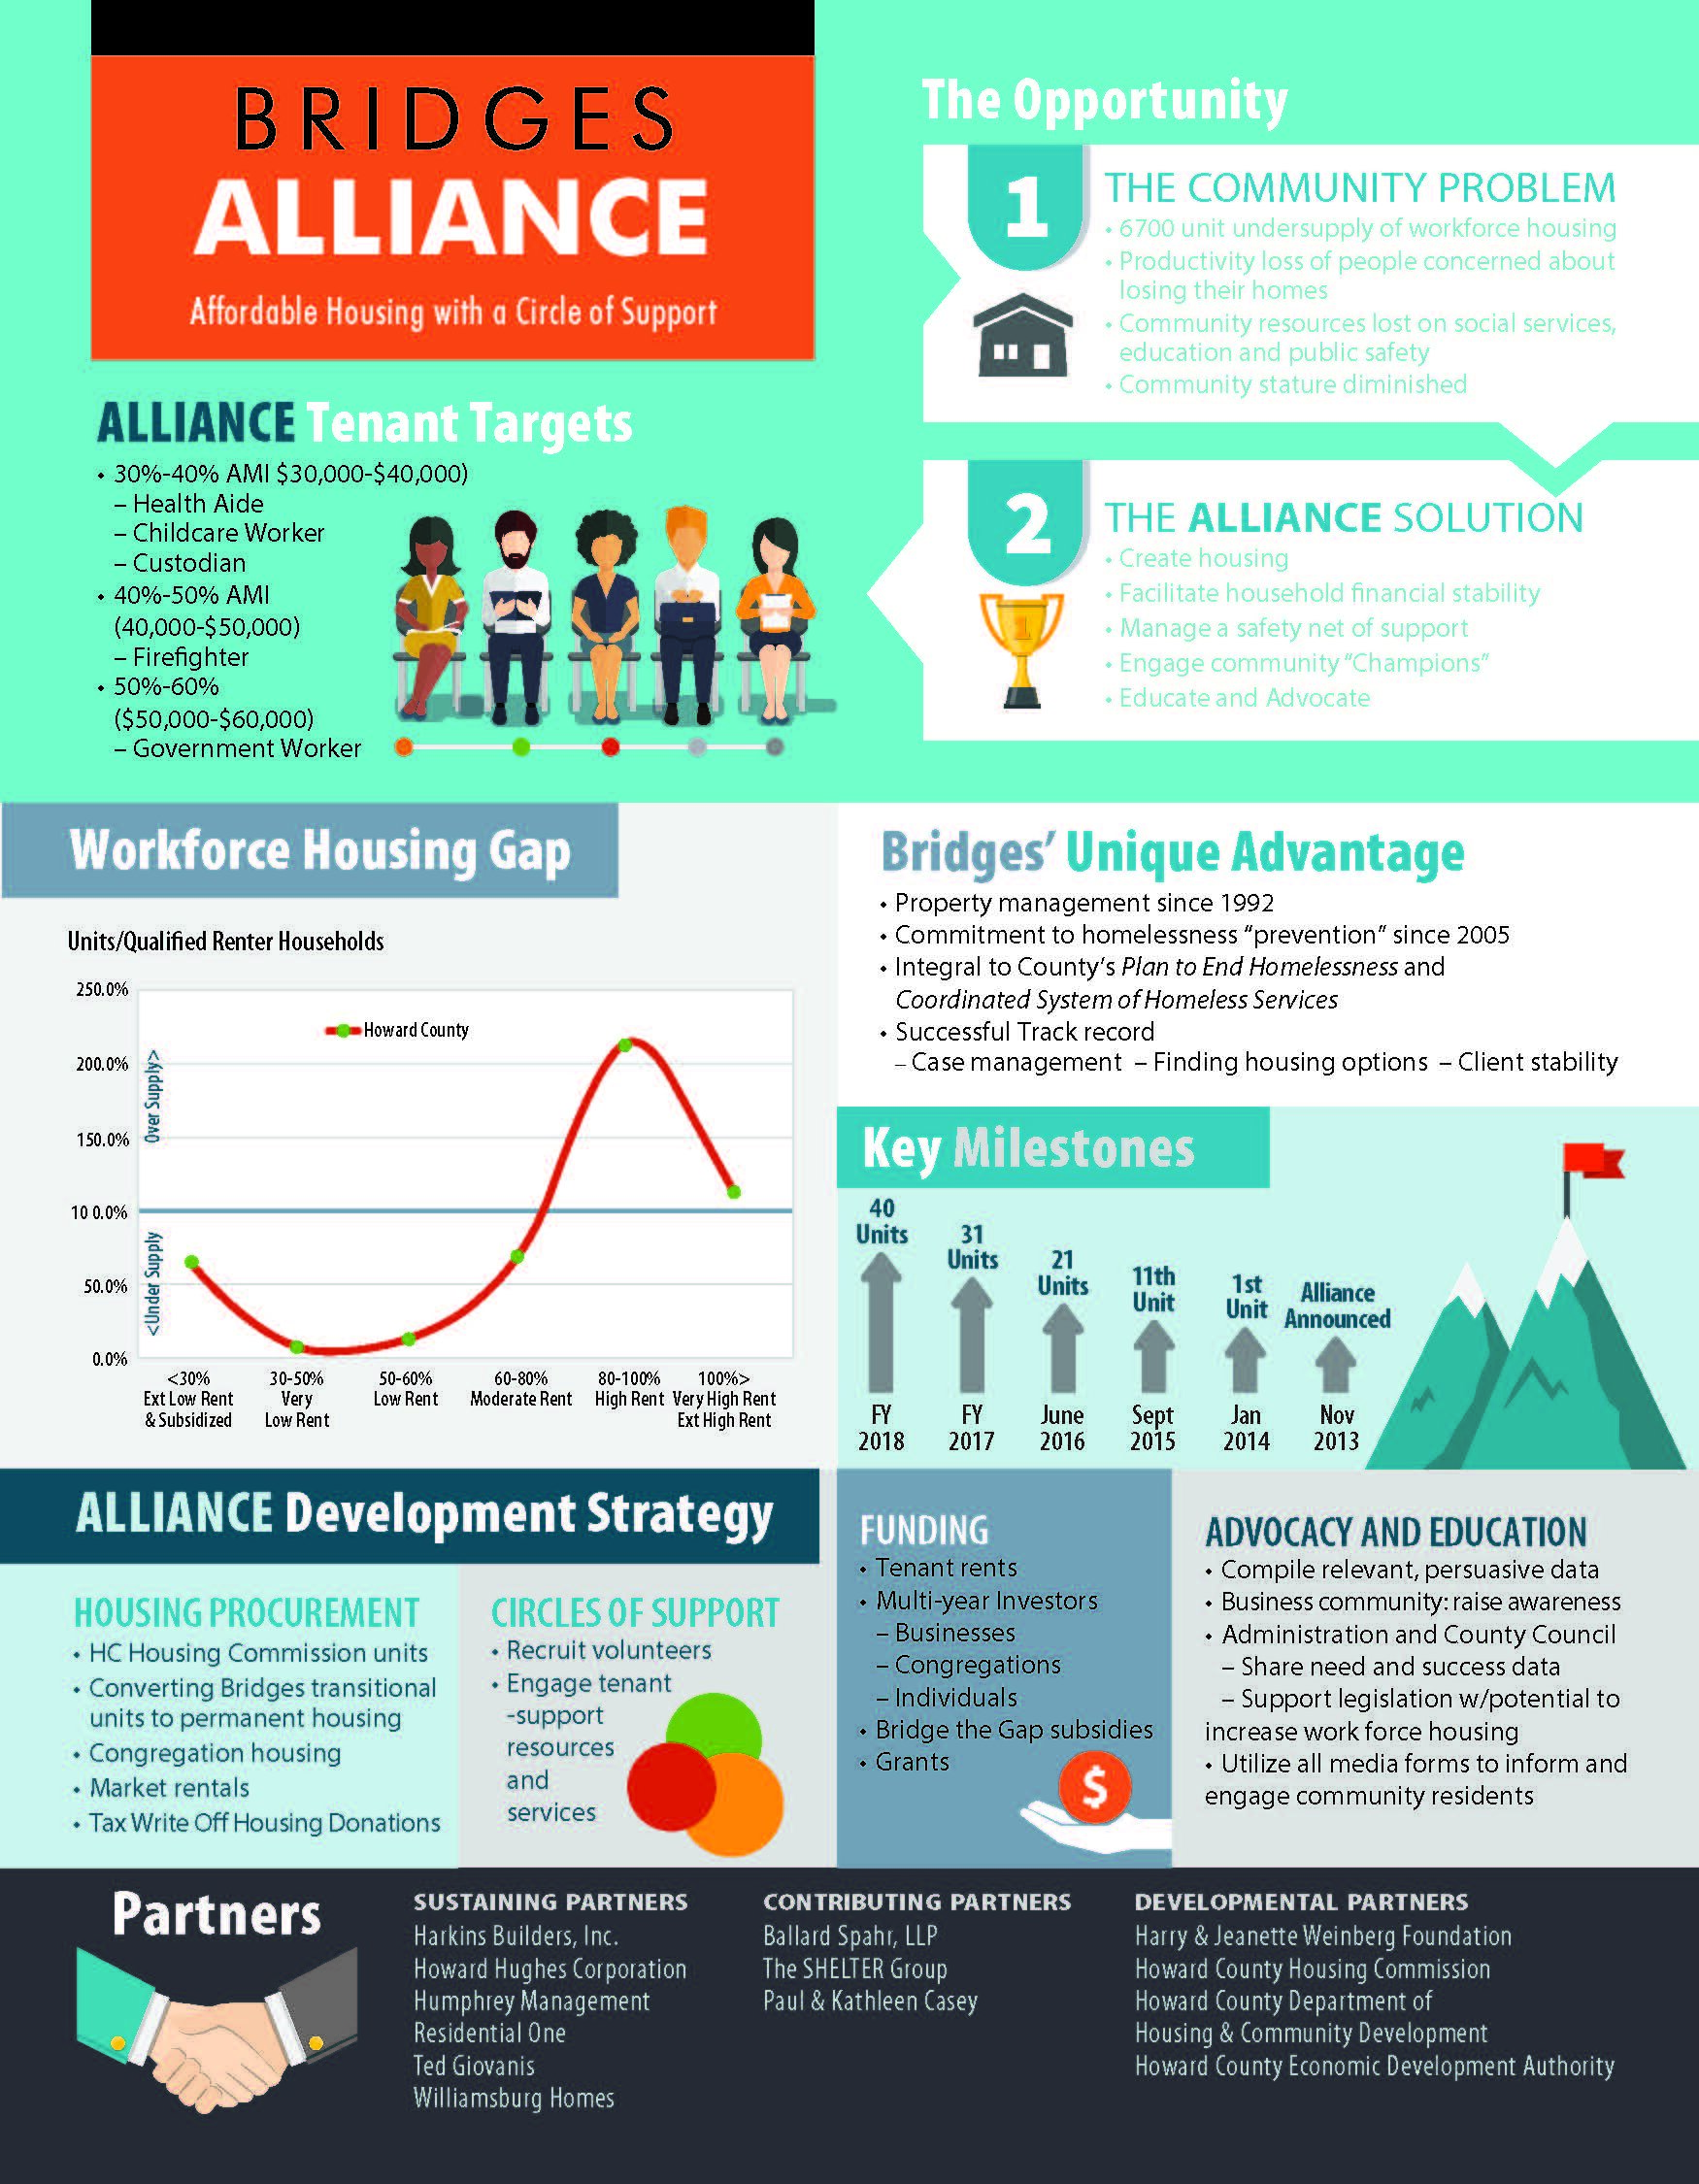 Bridges-Alliance-Infographic-2016.jpg